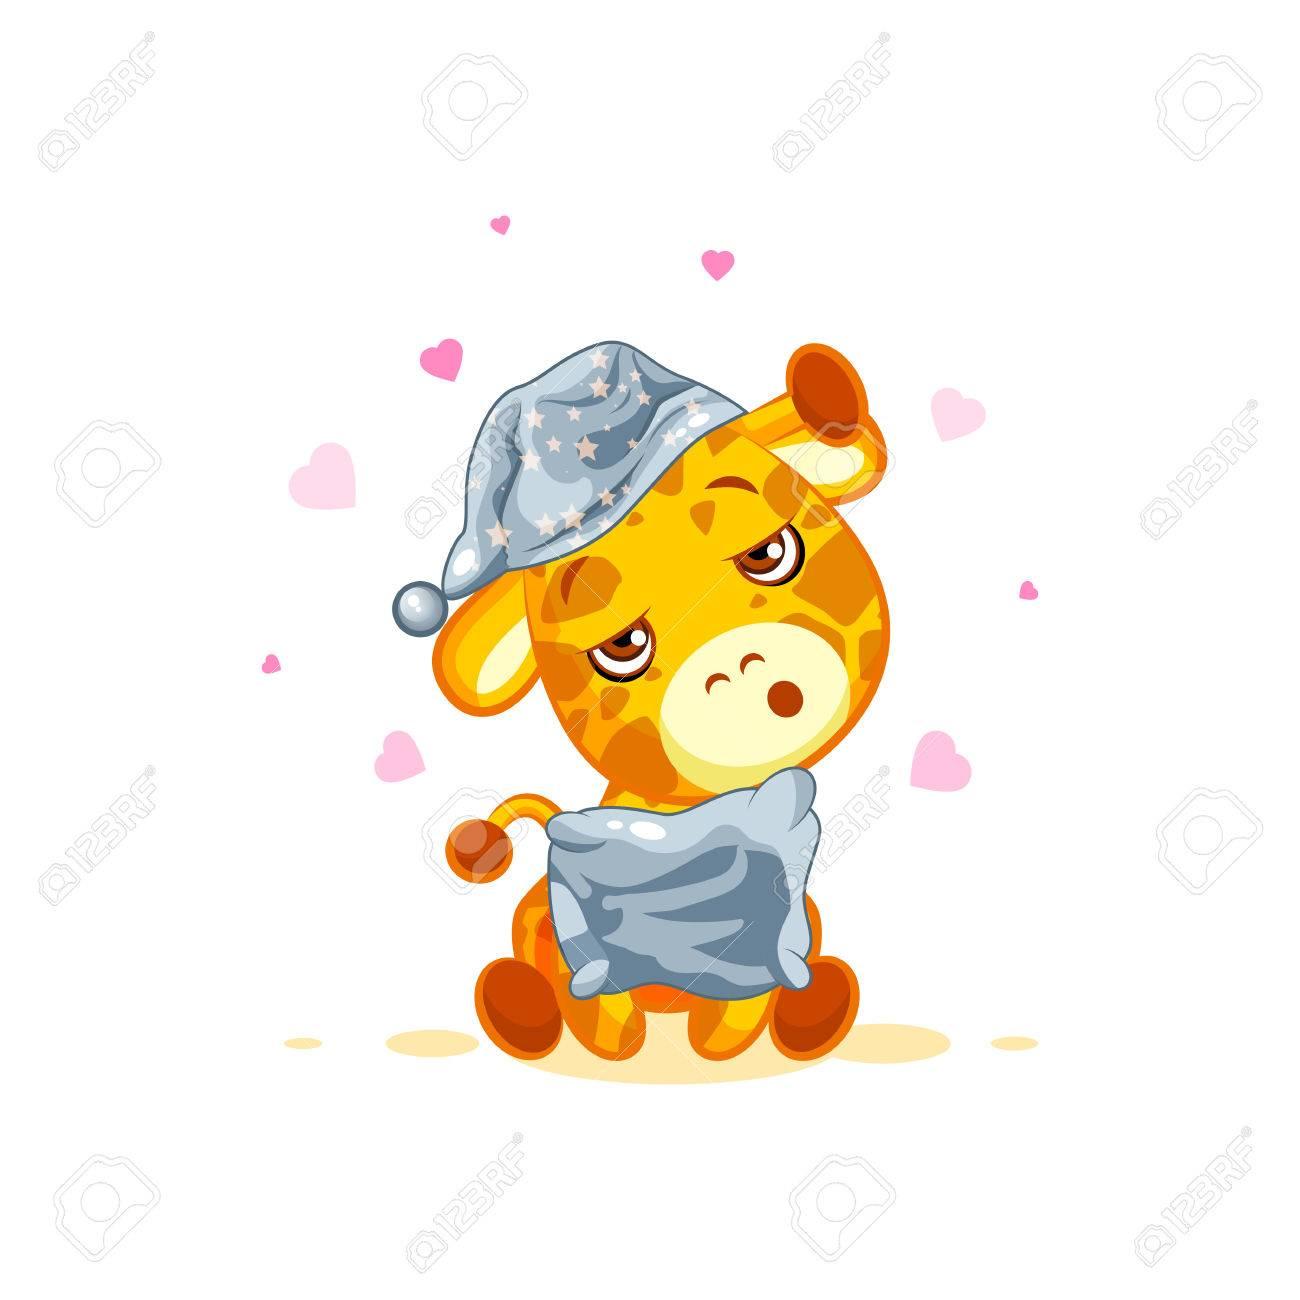 banque dimages emoji personnage dessin anim girafe malade avec un thermomtre en bouche moticne autocollant - Dessin Avec Emoji